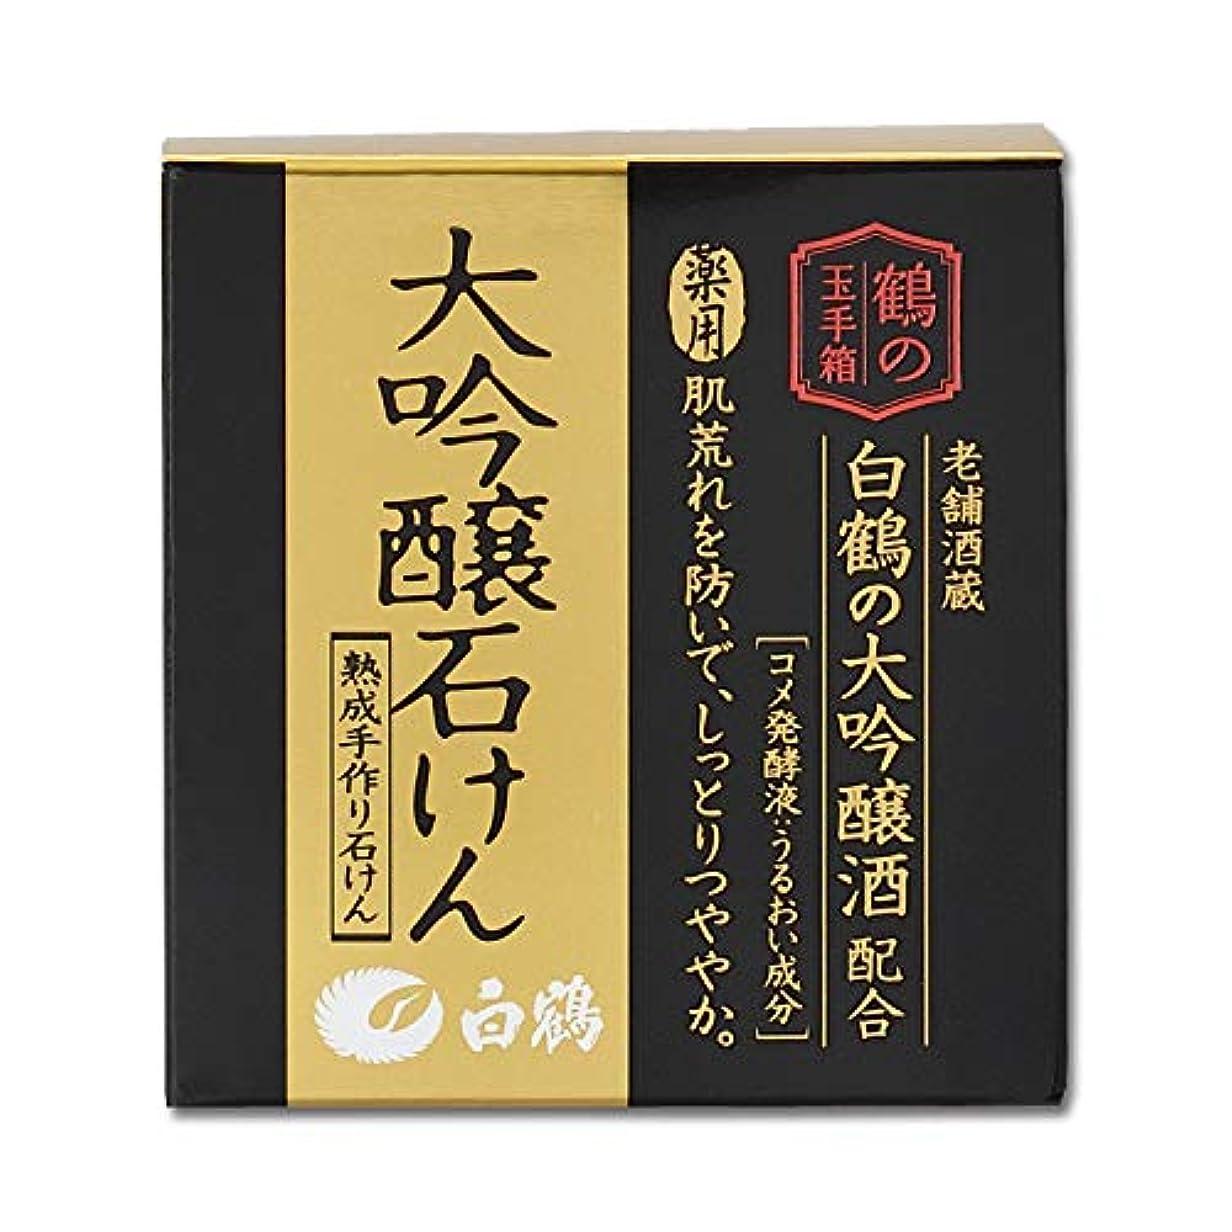 犯罪軍艦不健康白鶴 鶴の玉手箱 薬用 大吟醸石けん 100g (医薬部外品)